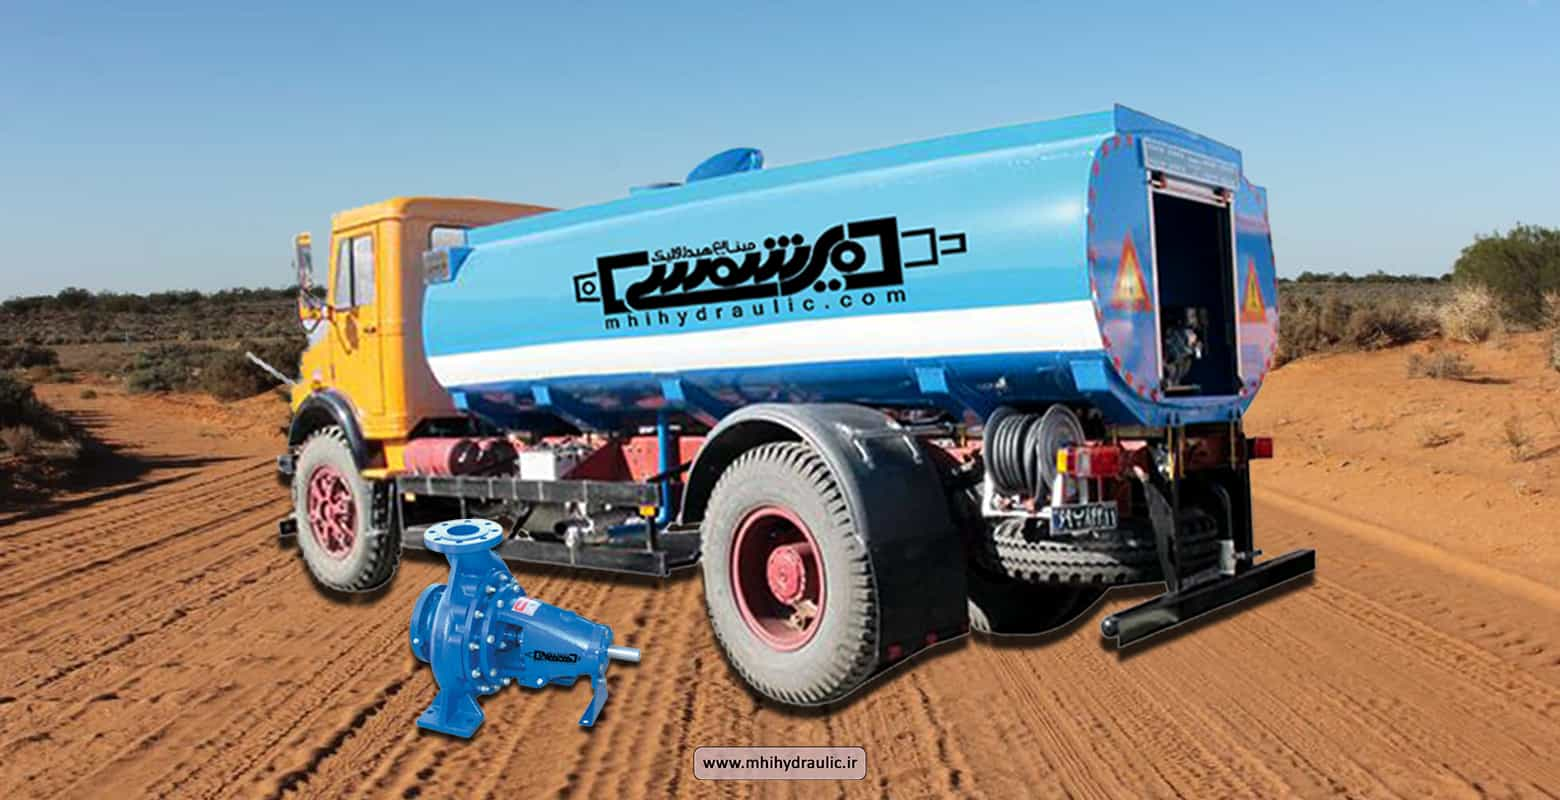 کامیون آب پاش 780 400